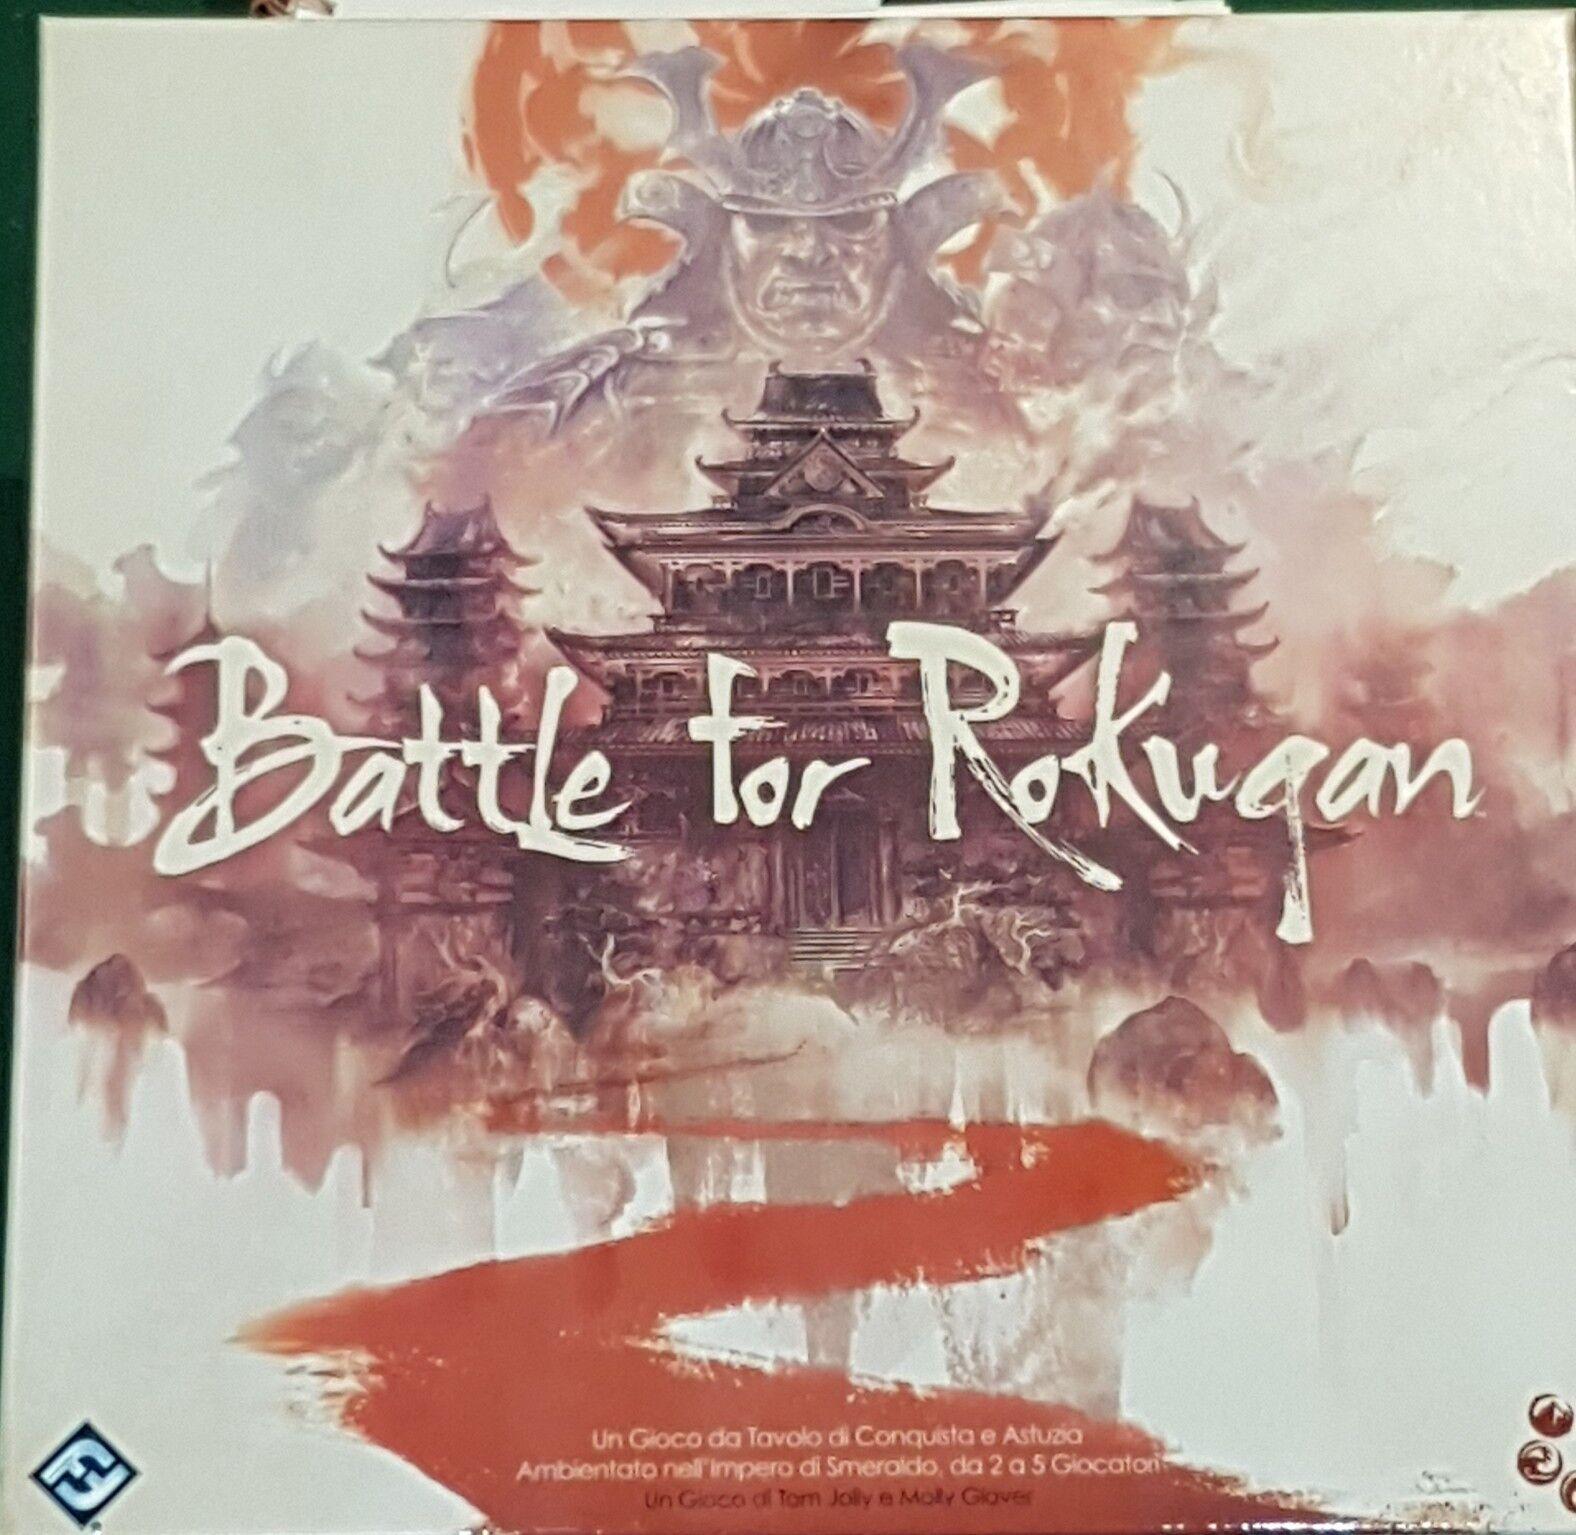 Battle For Rokugan - gioco da tavolo in italiano Asmodee Fantasy Flight